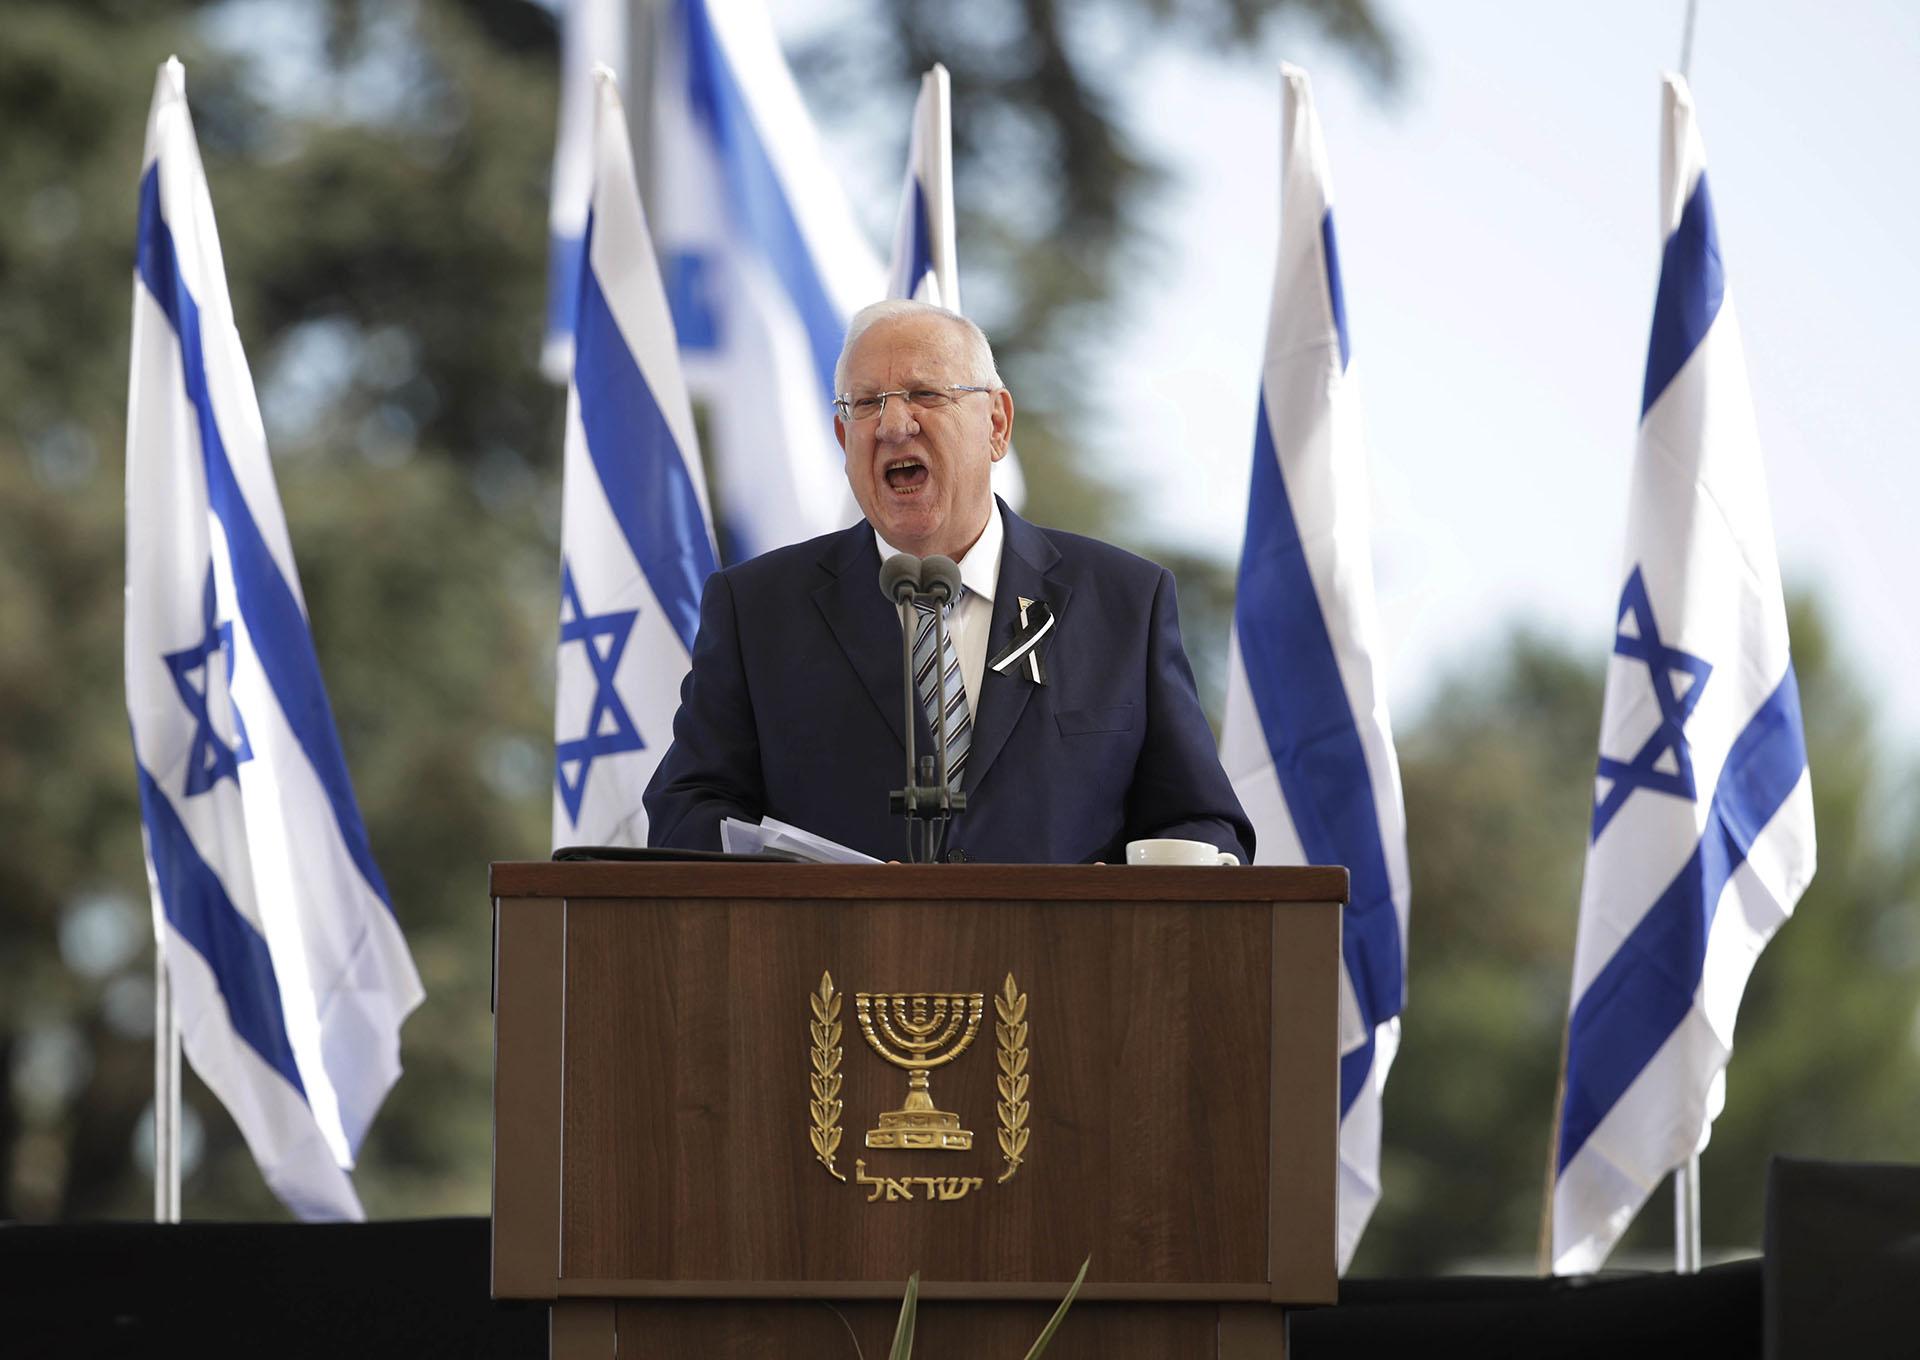 El president de Israel, Reuven Rivlin (AP Photo/Carolyn Kaster)